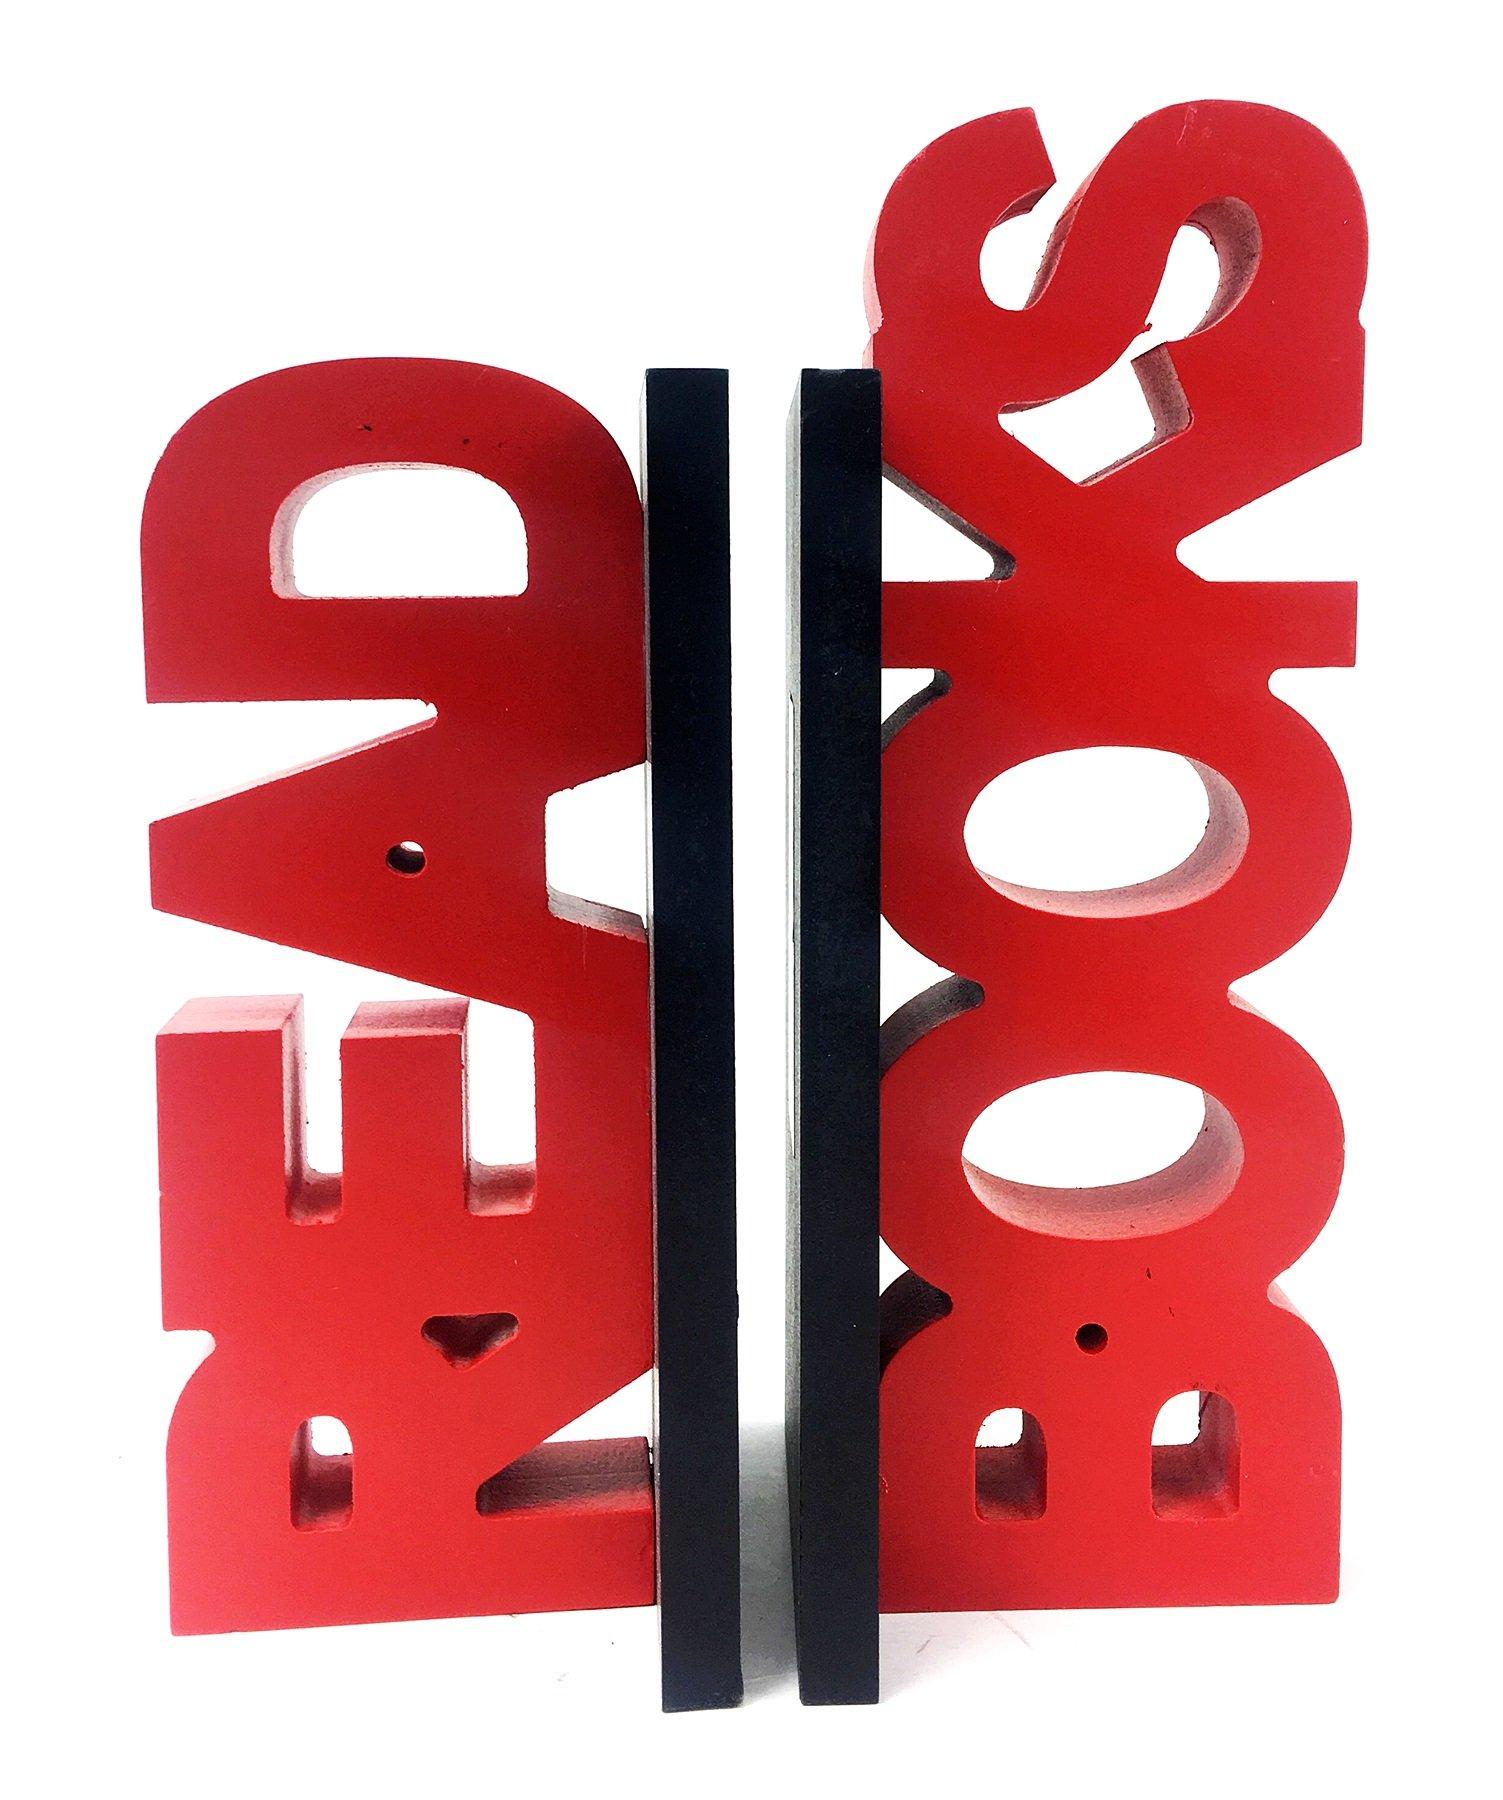 Bellaa 22779 Read Bookends Wood Handmade 10 Inch